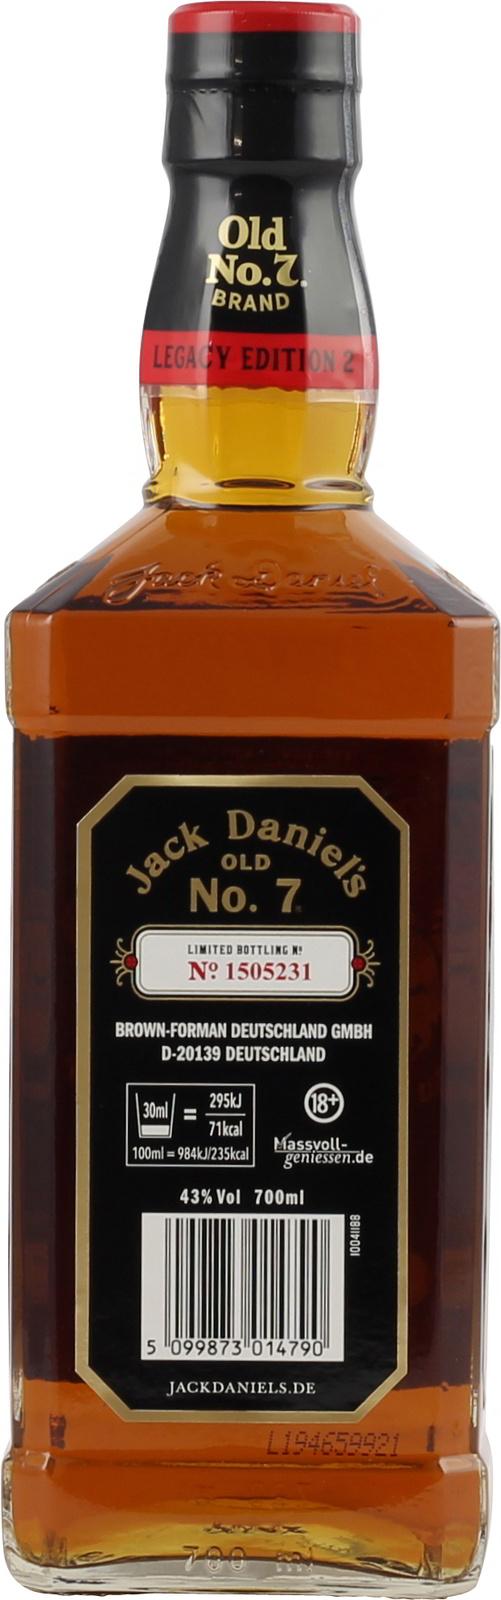 Jack Daniels Legacy Edition 2 1905, limitiert